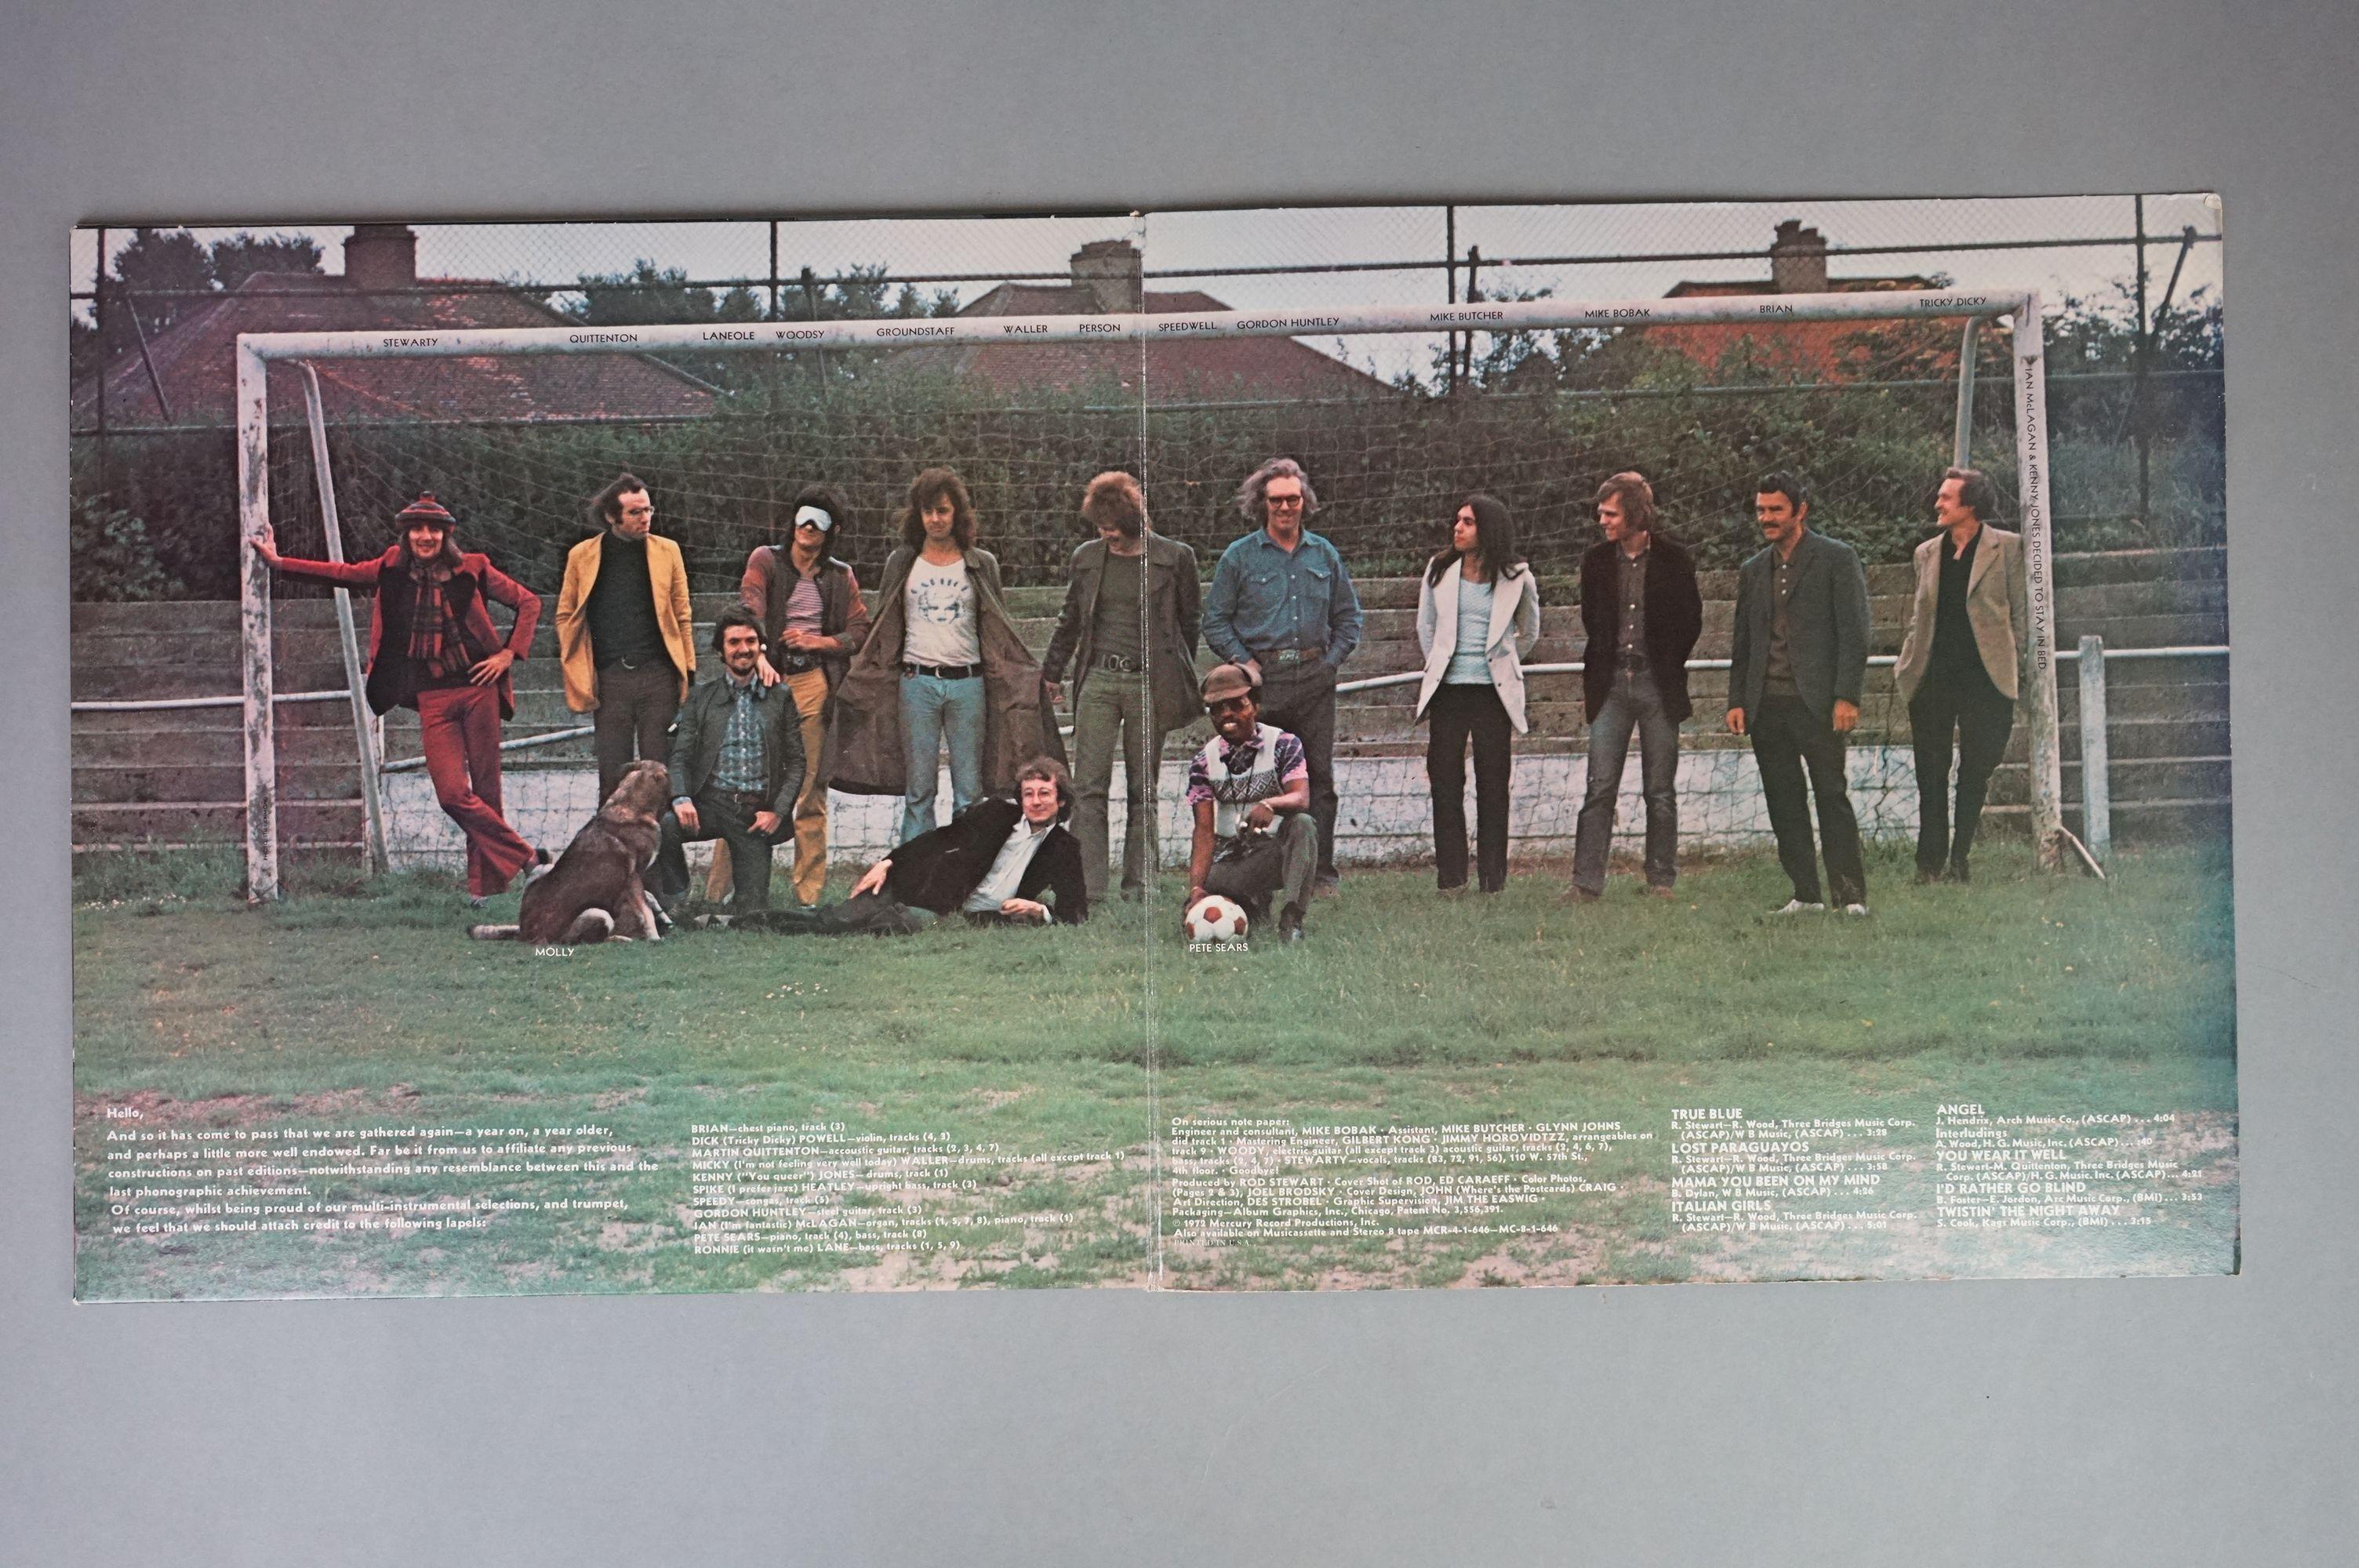 Vinyl - Rod Stewart 4 LP's to include An Old Raincoat Won't Ever Let You Down (Vertigo VO4) gatefold - Image 5 of 14